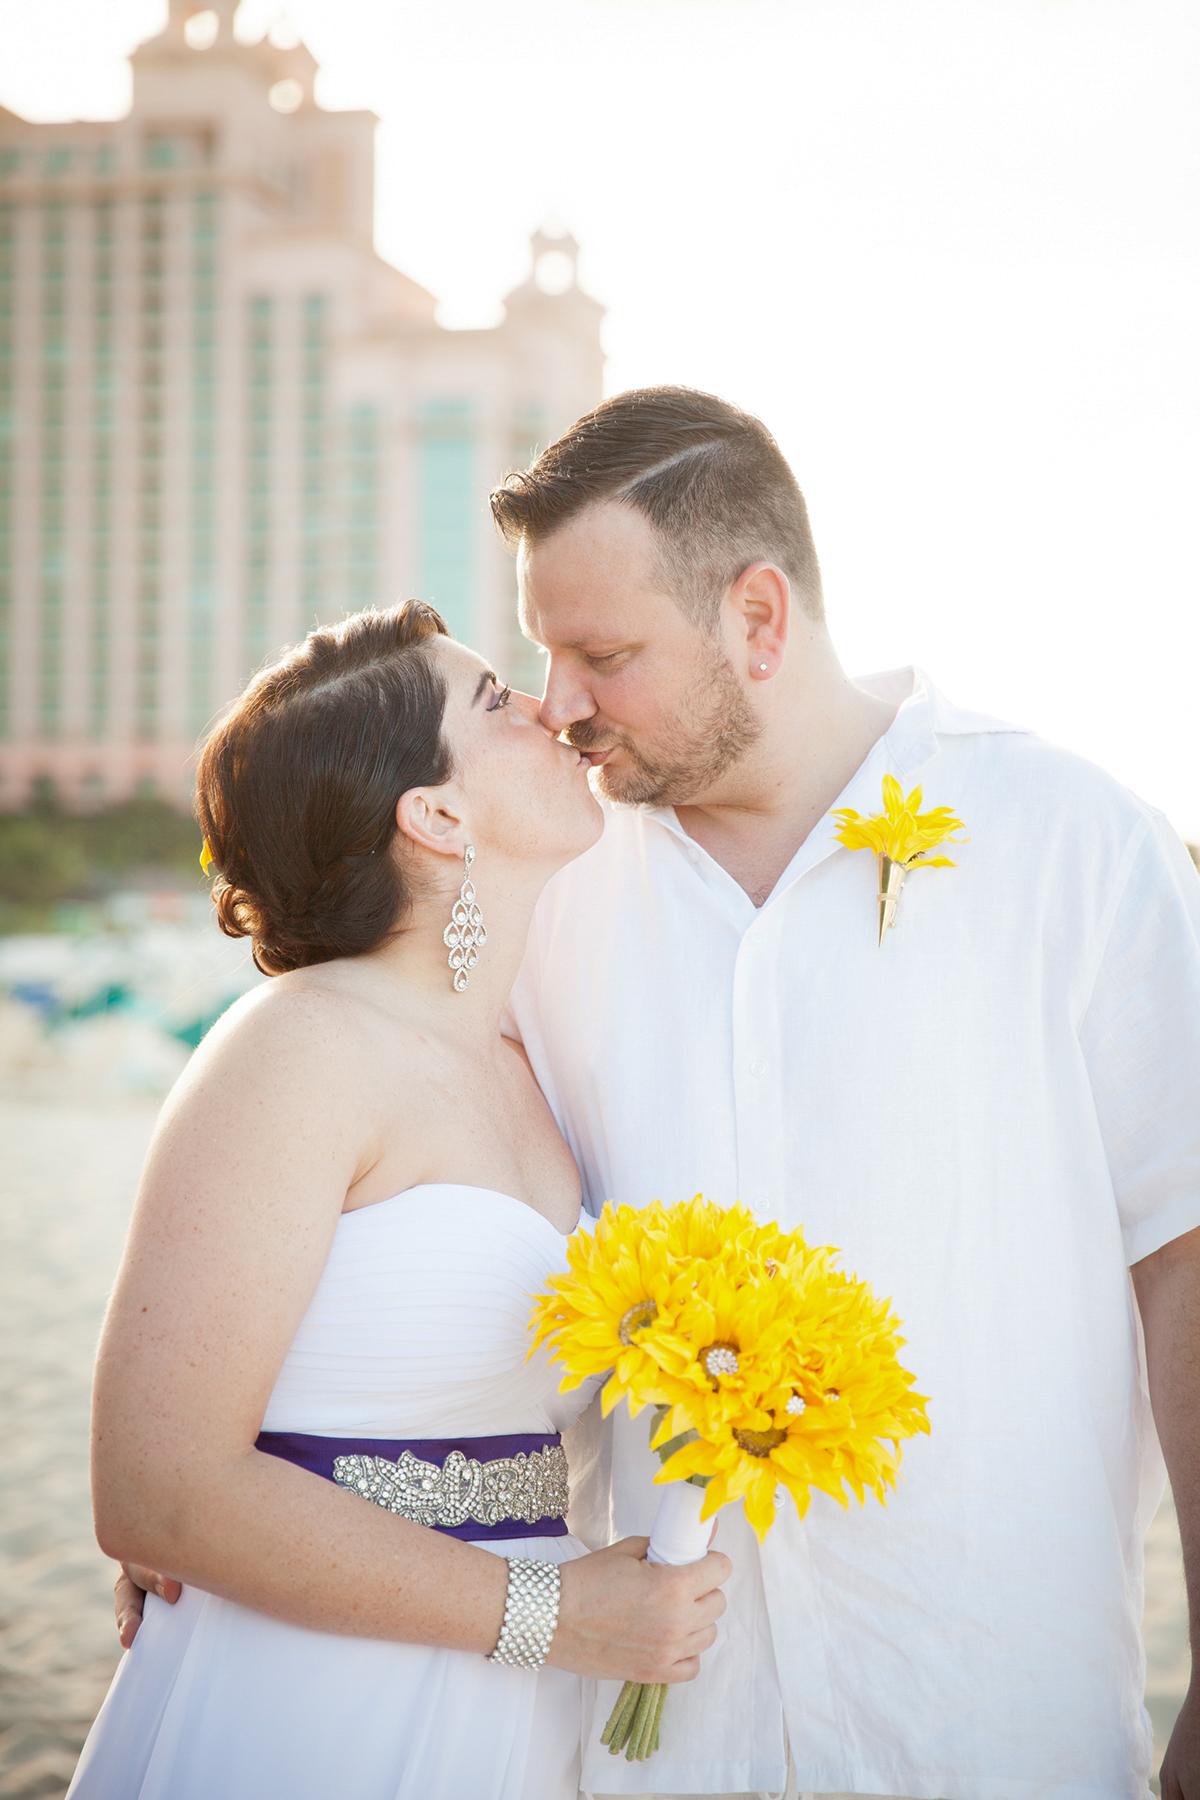 Daniela-Edvard_wedding_Dukat-Photos-1314.jpg